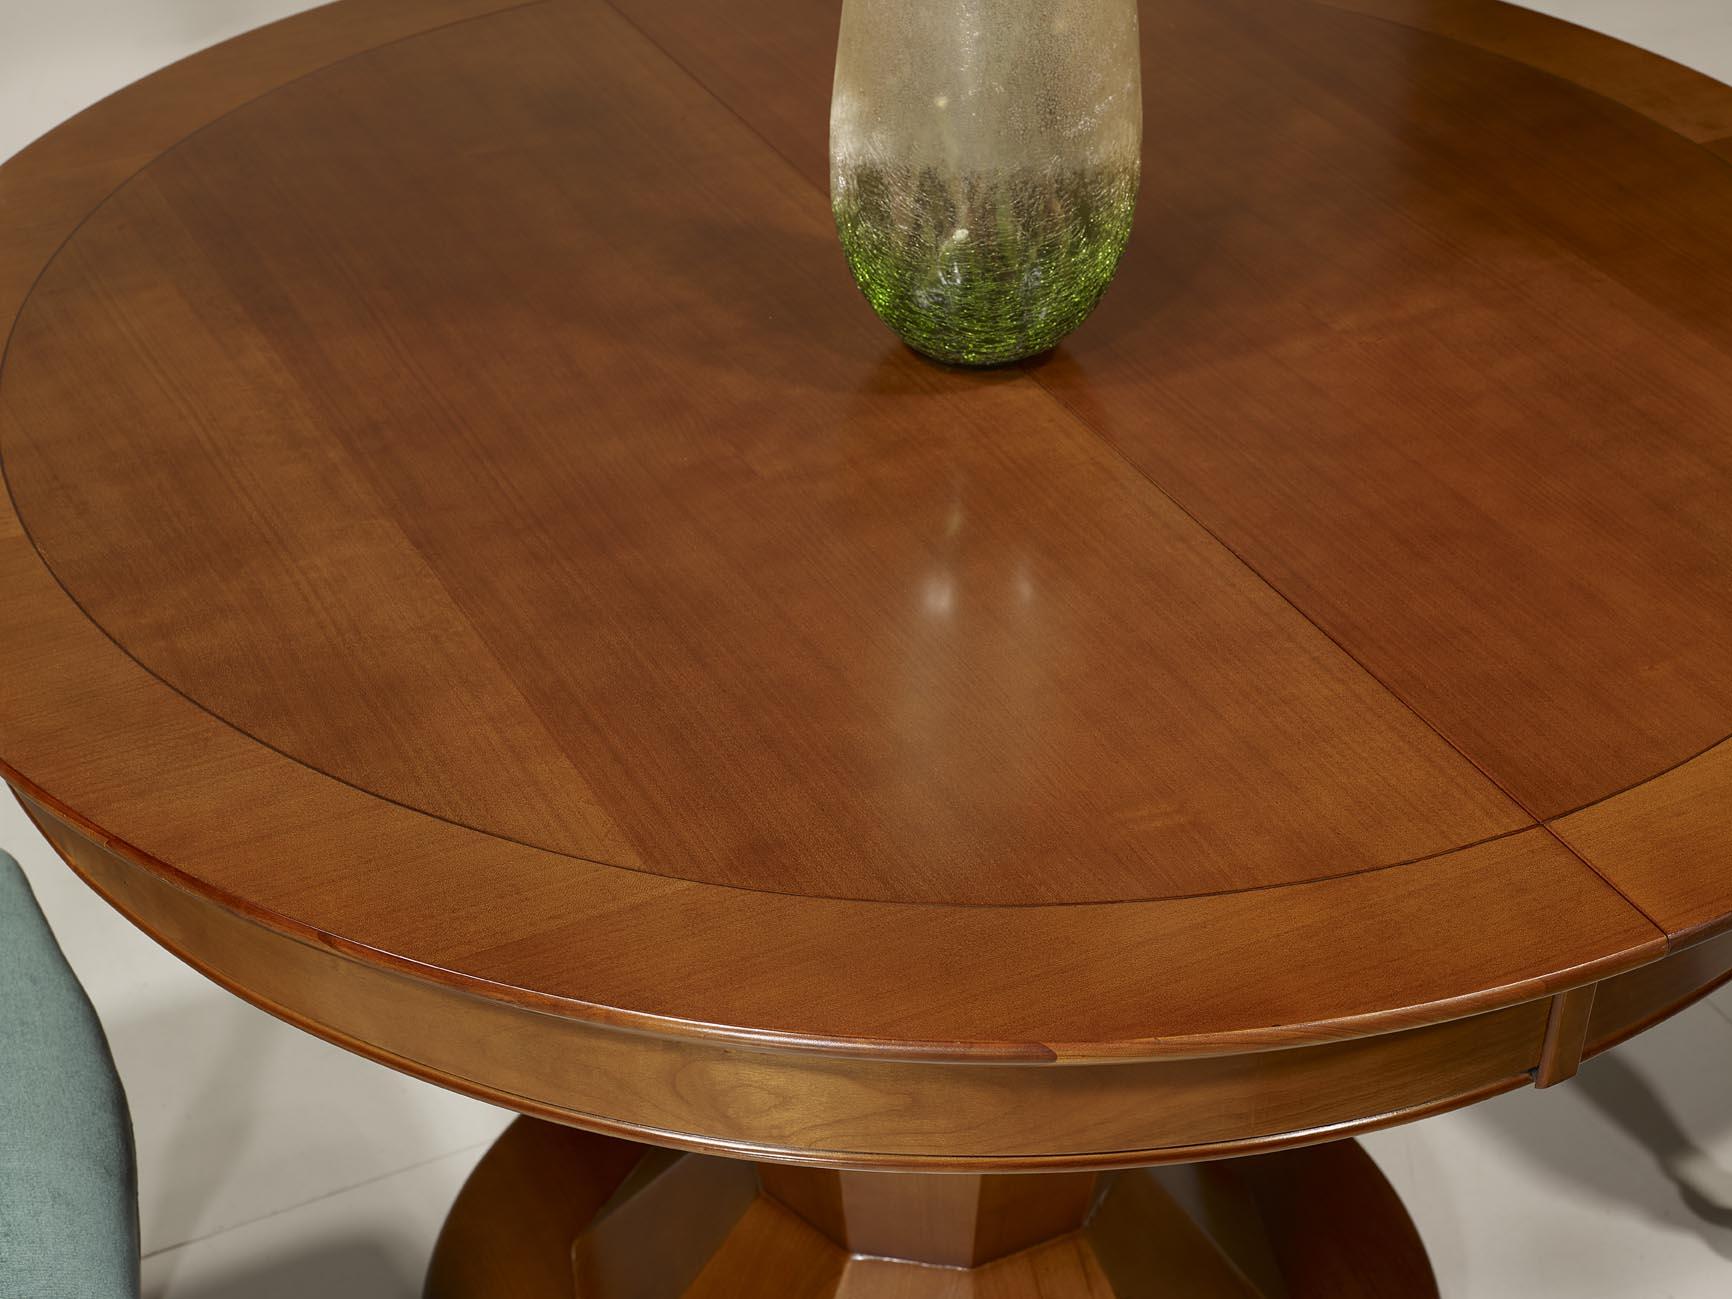 table ronde pied central en merisier de style contemporain. Black Bedroom Furniture Sets. Home Design Ideas